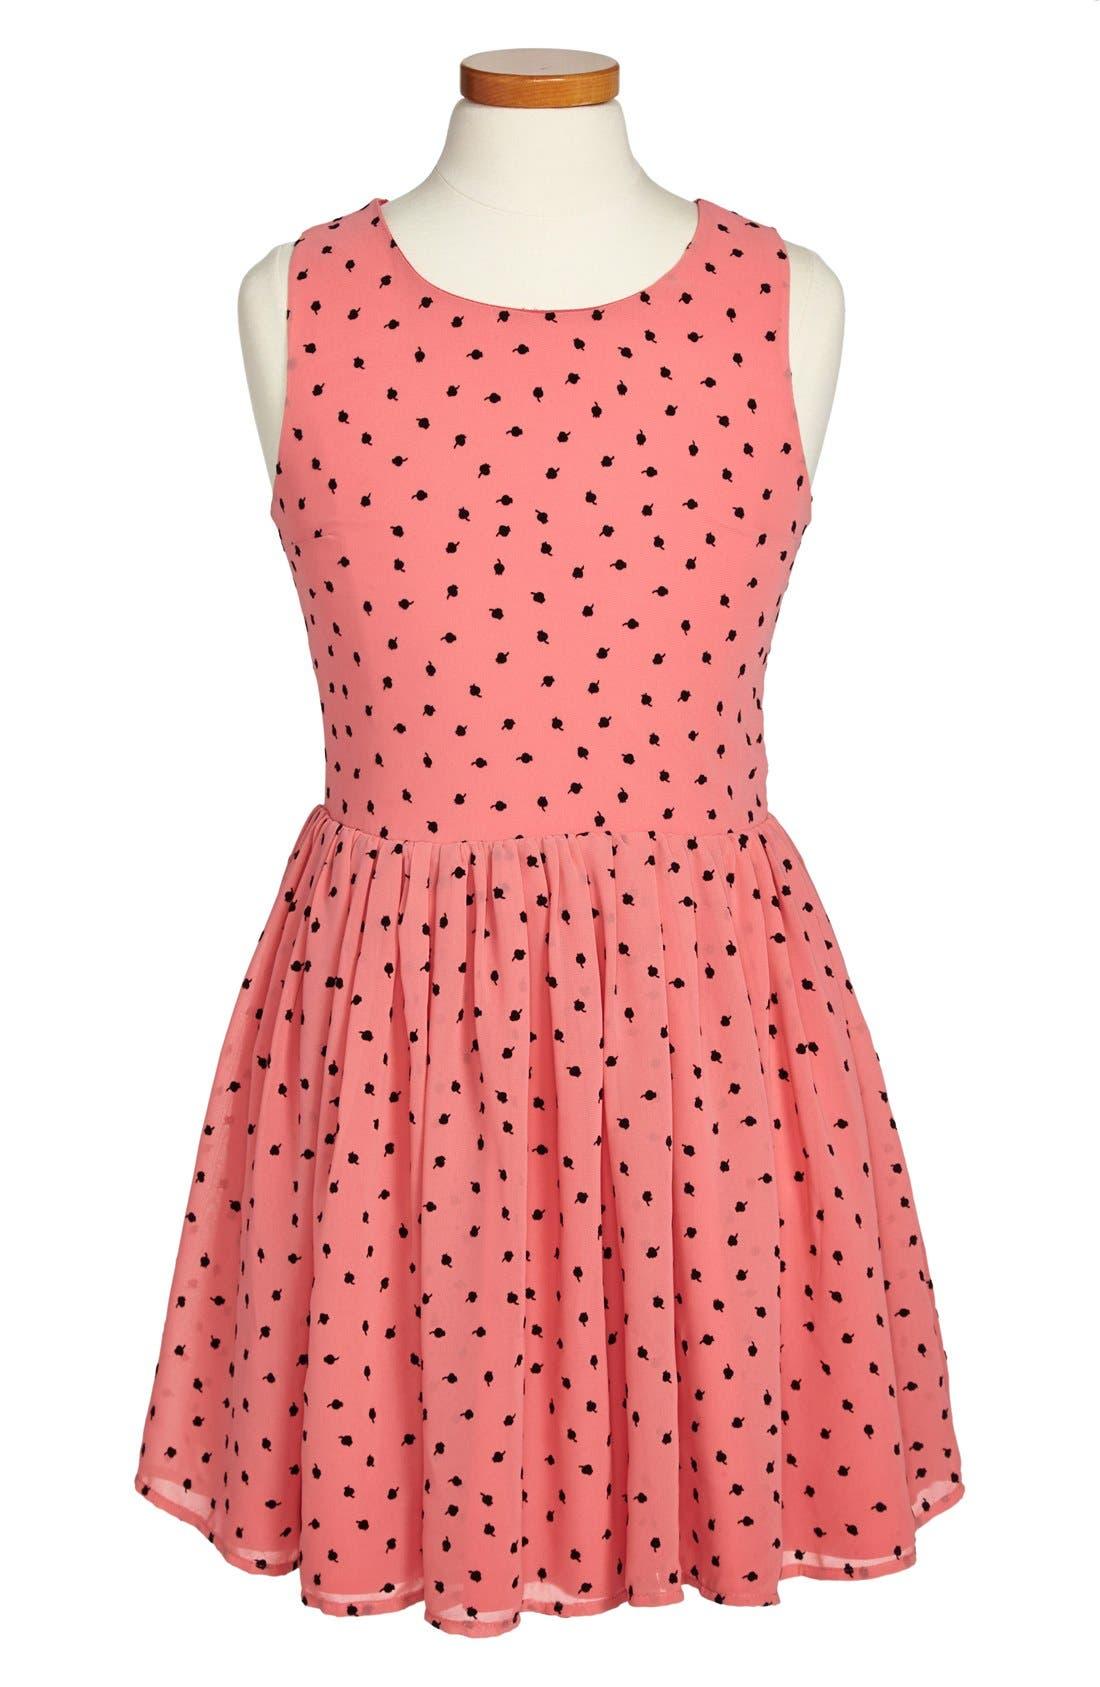 Alternate Image 1 Selected - Miss Behave 'Tulip' Chiffon Dress (Big Girls)